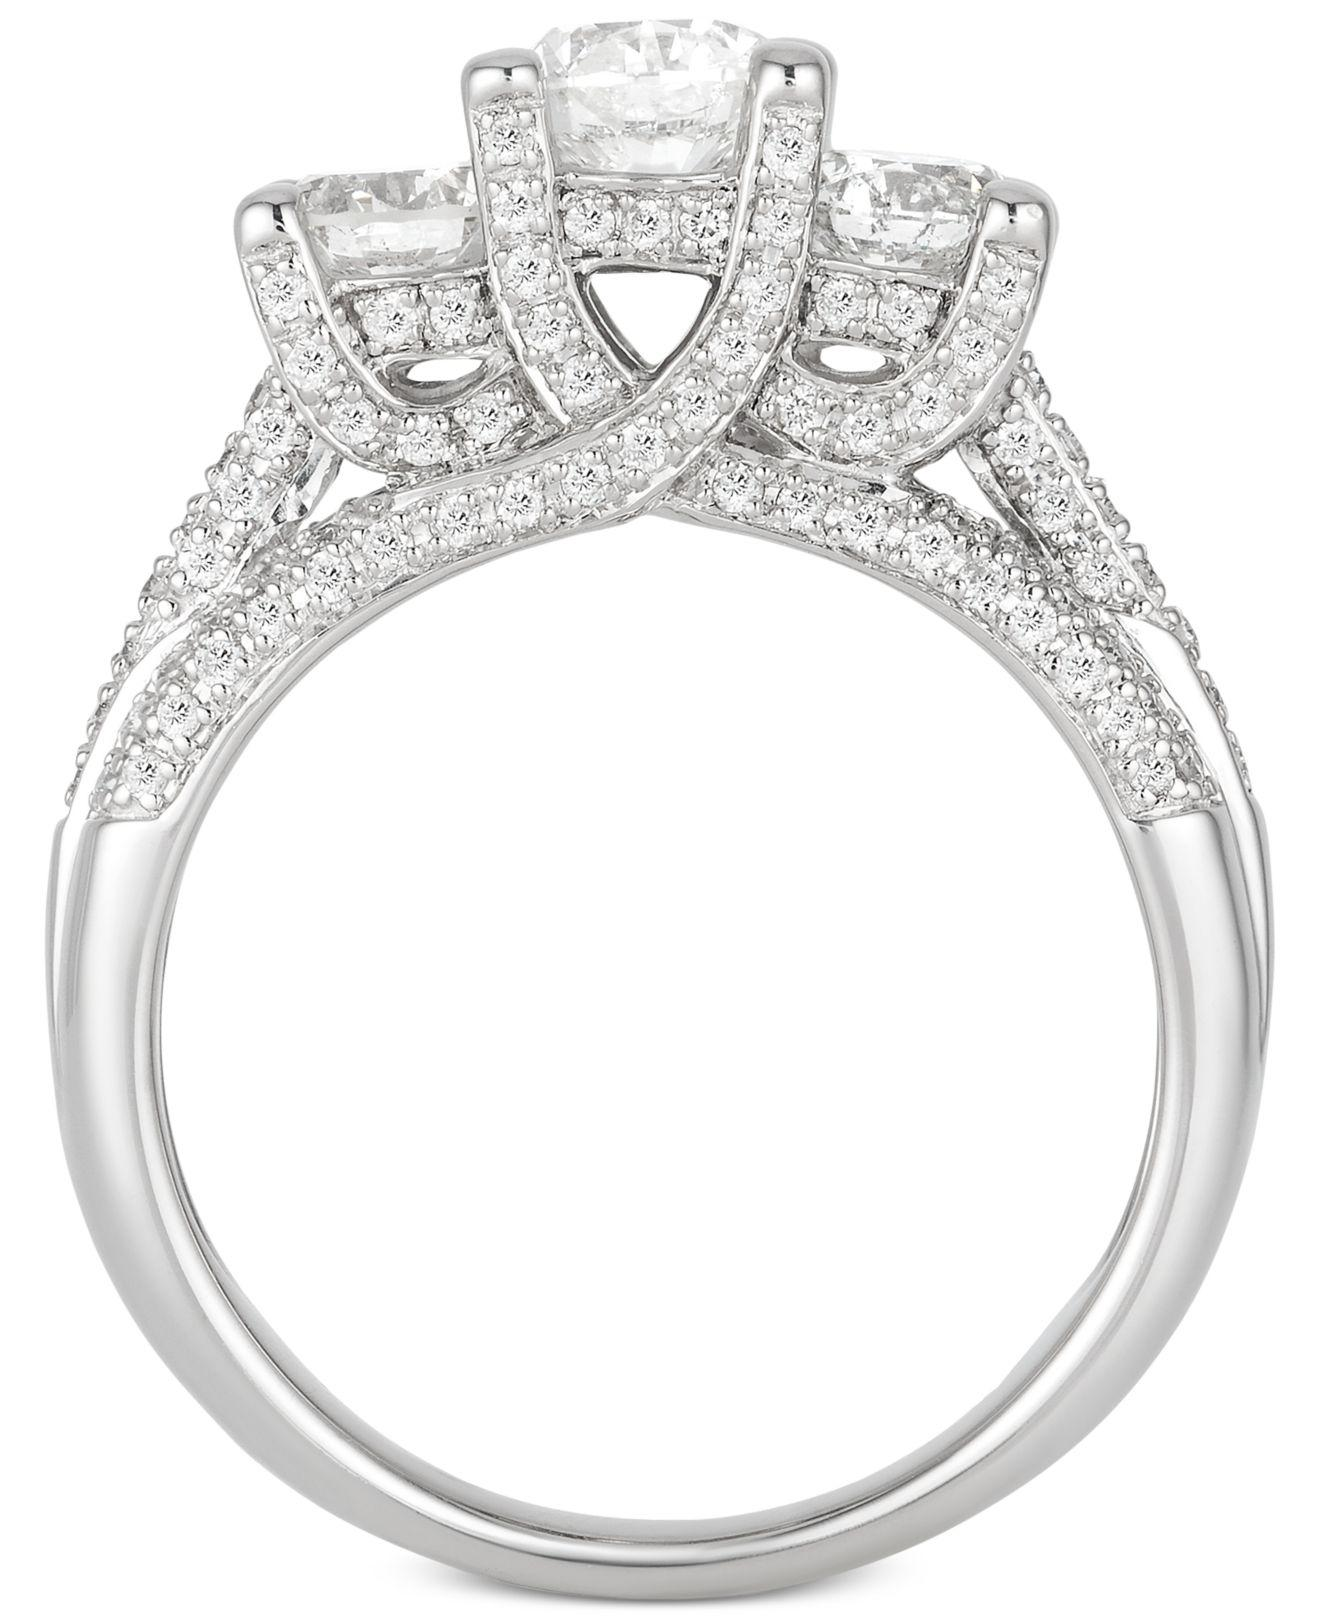 8f3ab4dd77df Lyst - Macy s Diamond Three-stone Pavé Engagement Ring (1-3 4 Ct. T.w.) In  14k White Gold in Metallic